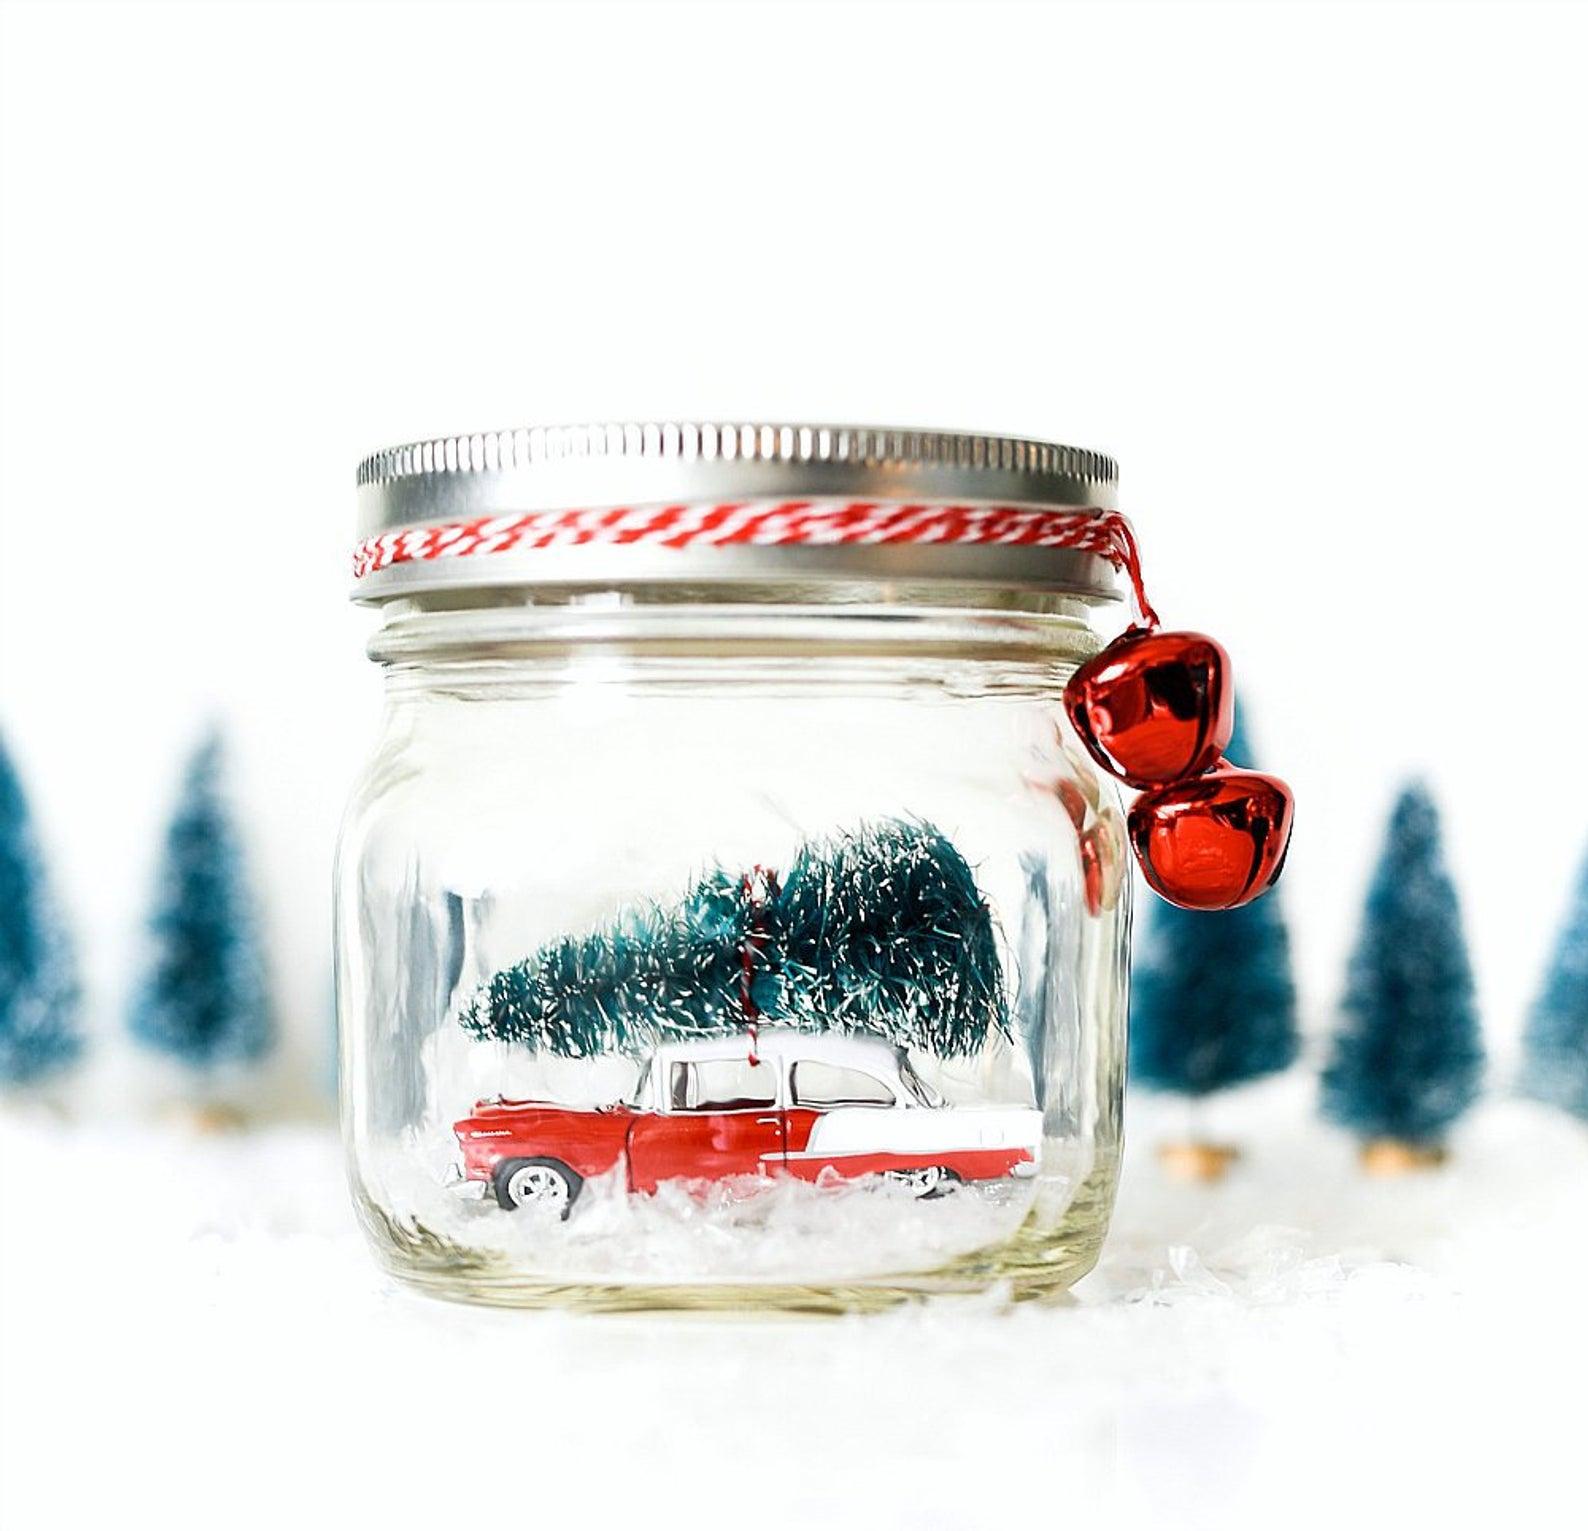 Car in Mason Jar Snow Globe Kit By Drop Cloth Design Co.